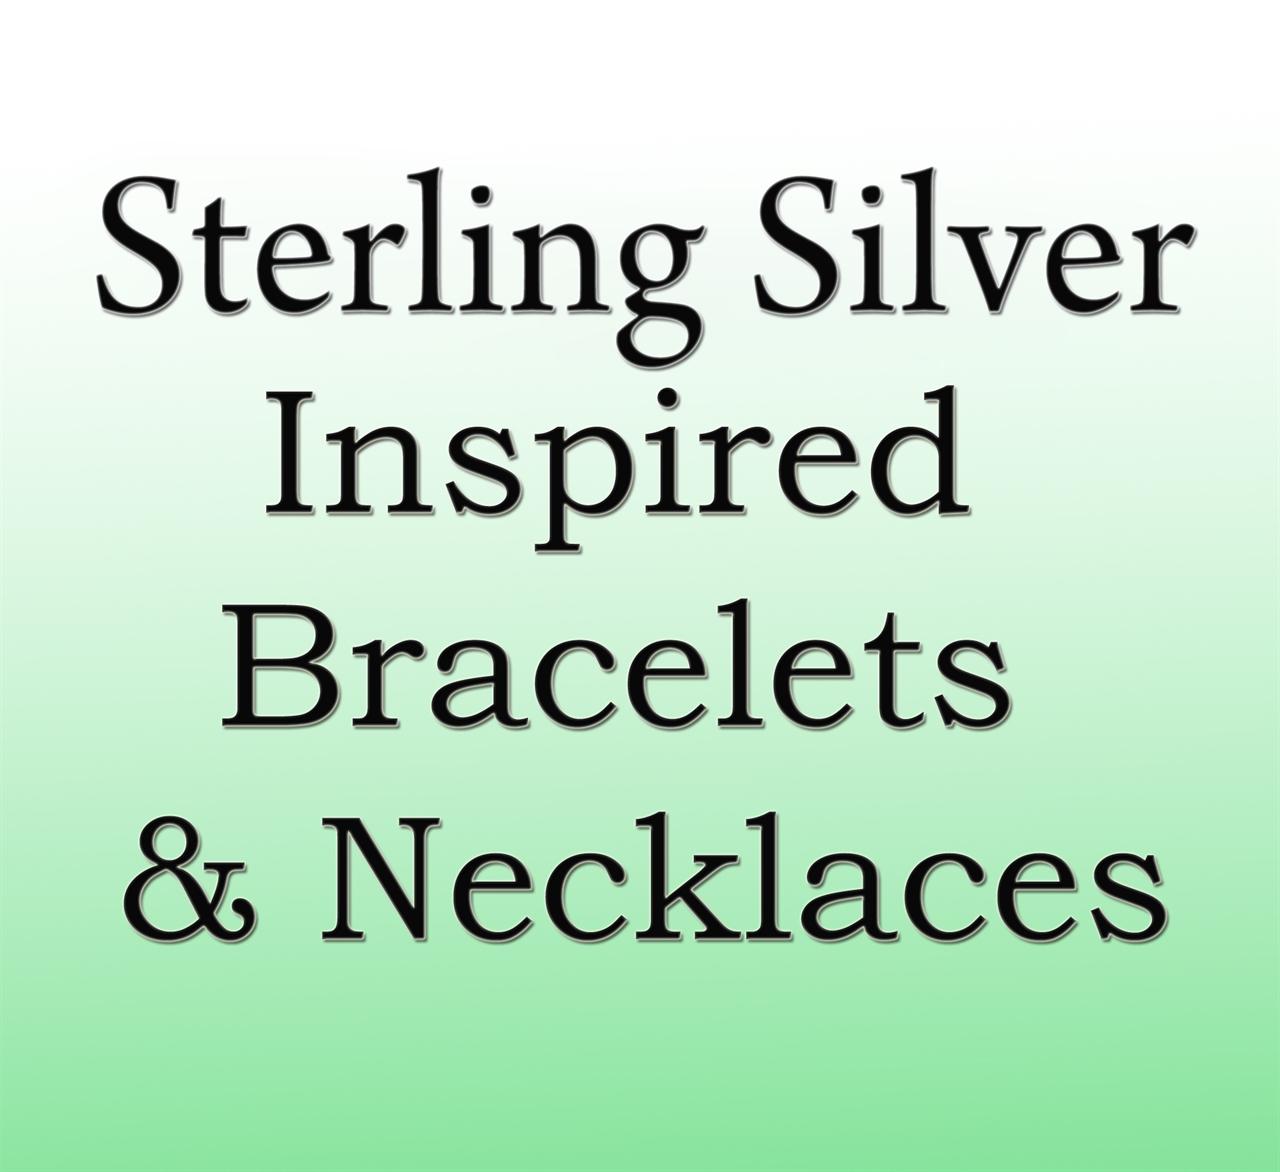 Sterling Silver Inspired Bracelets